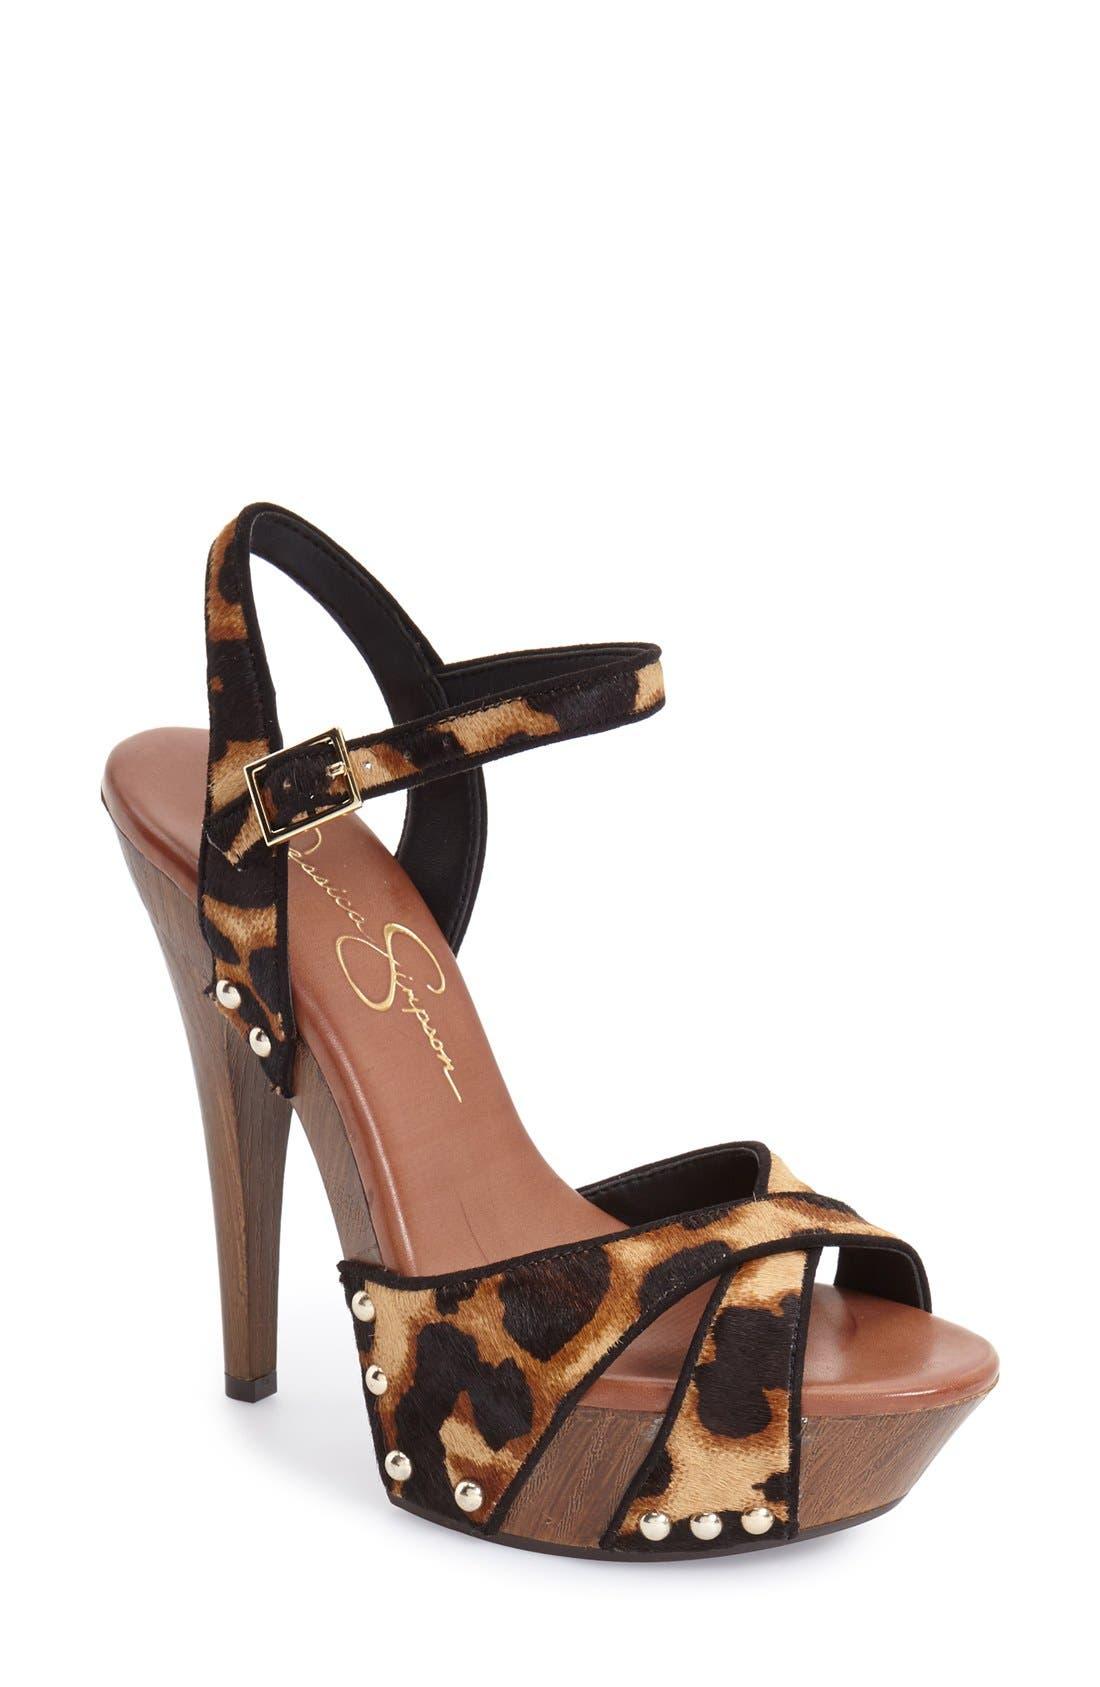 Alternate Image 1 Selected - Jessica Simpson 'Faraday' Platform Sandal (Women)